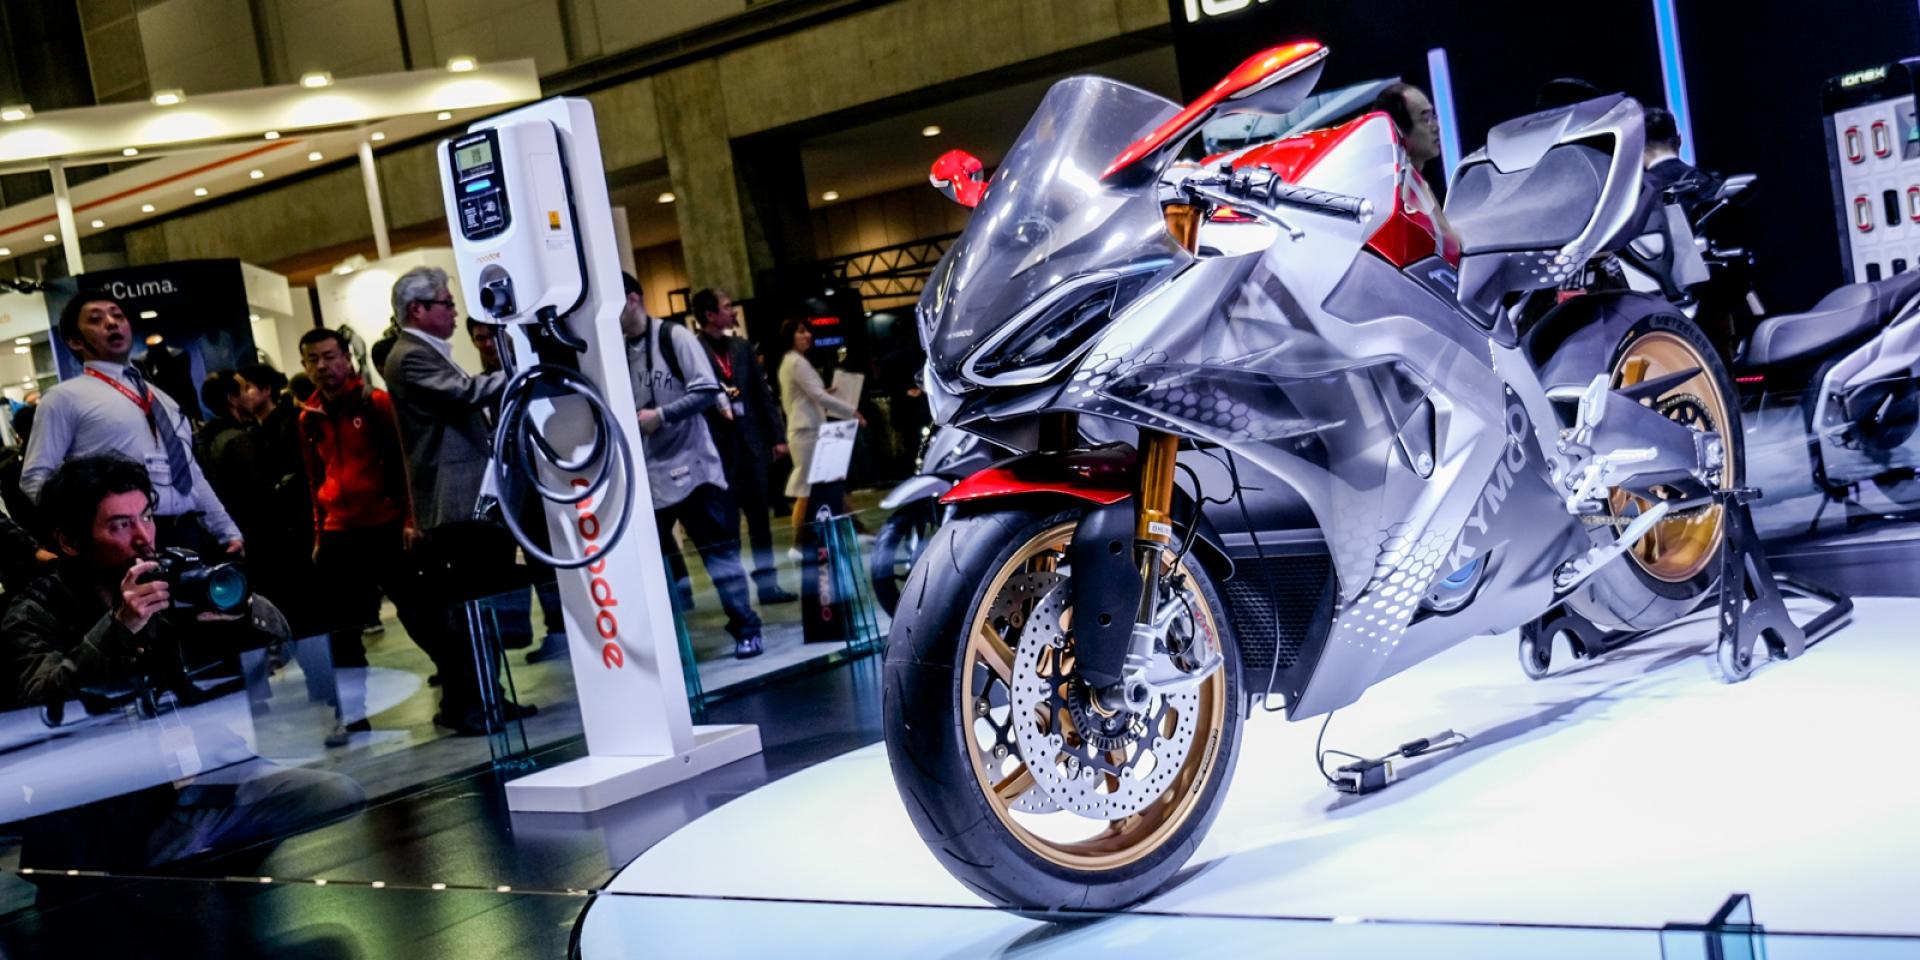 SuperNEX首度登陸日本、Noodoe EV OS充電服務發表,KYMCO 2019東京車展發表會